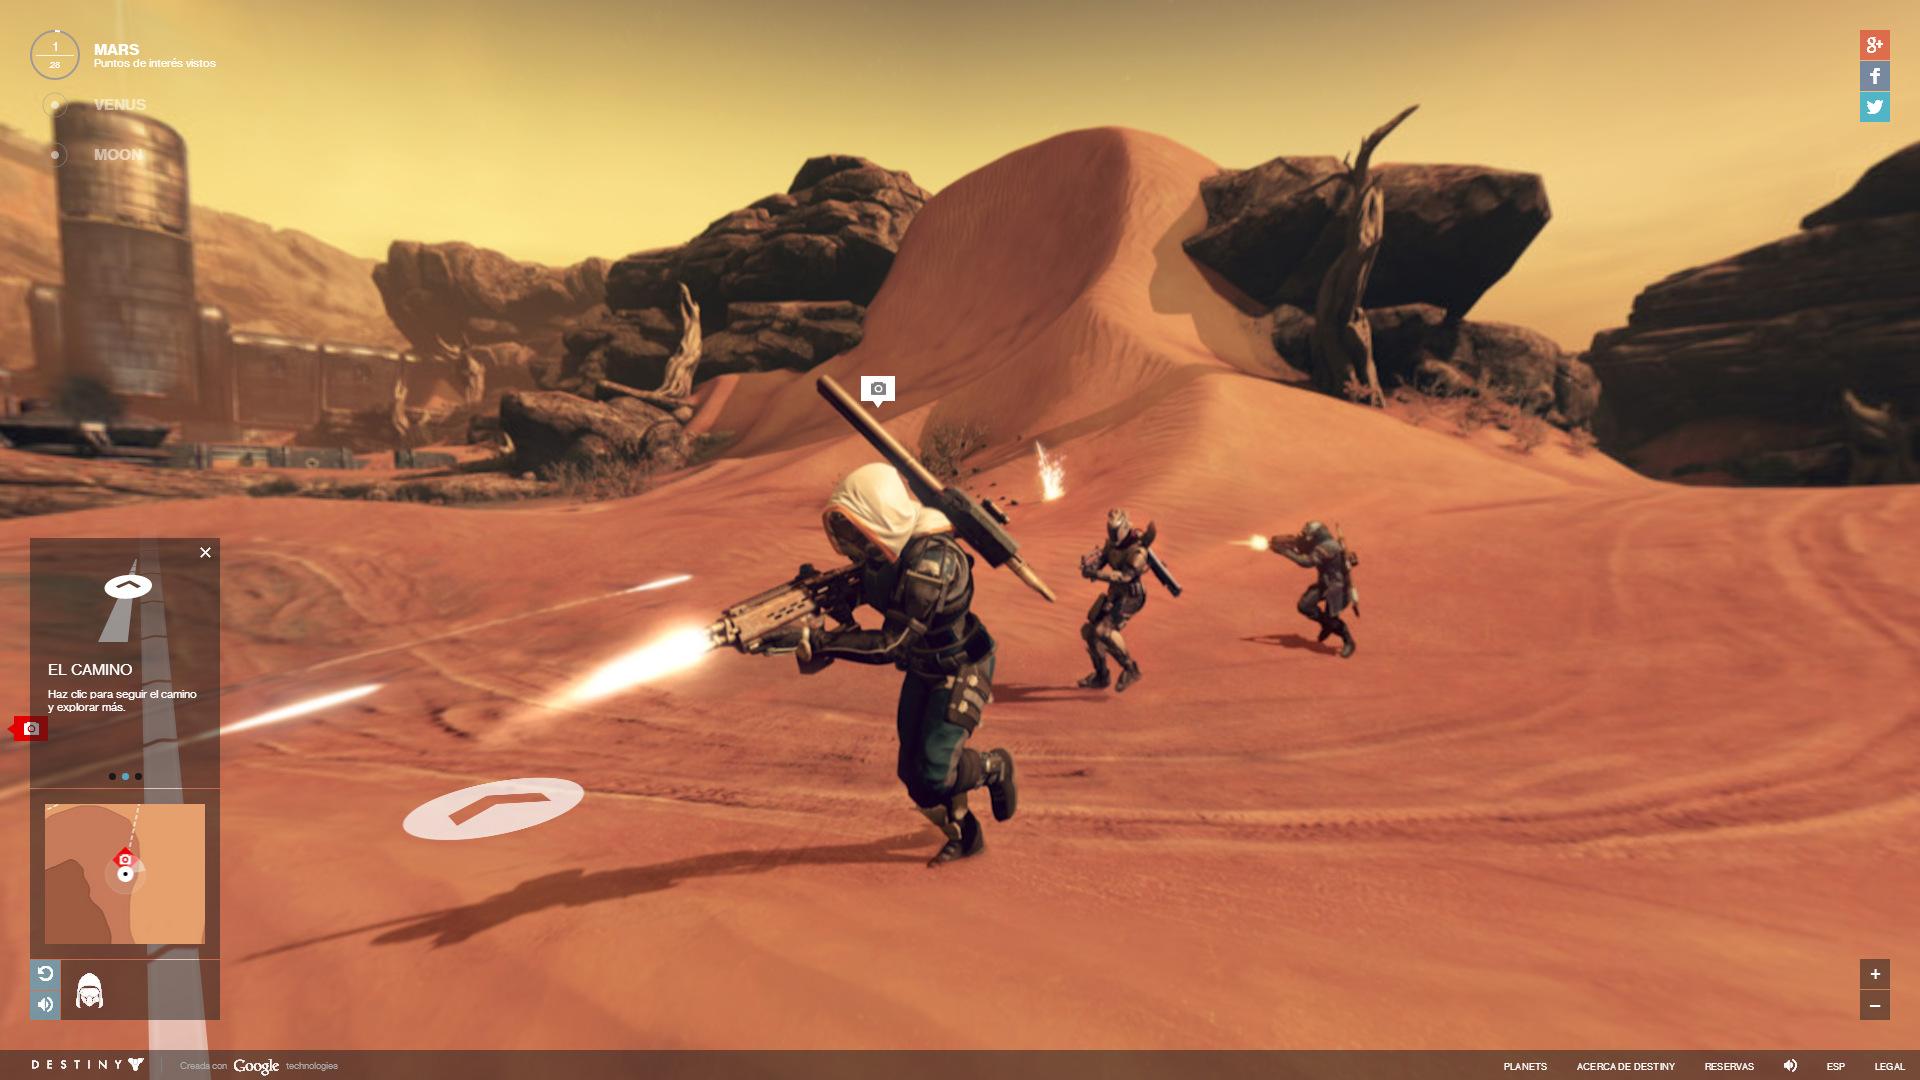 Destiny Google maps planet view (3)